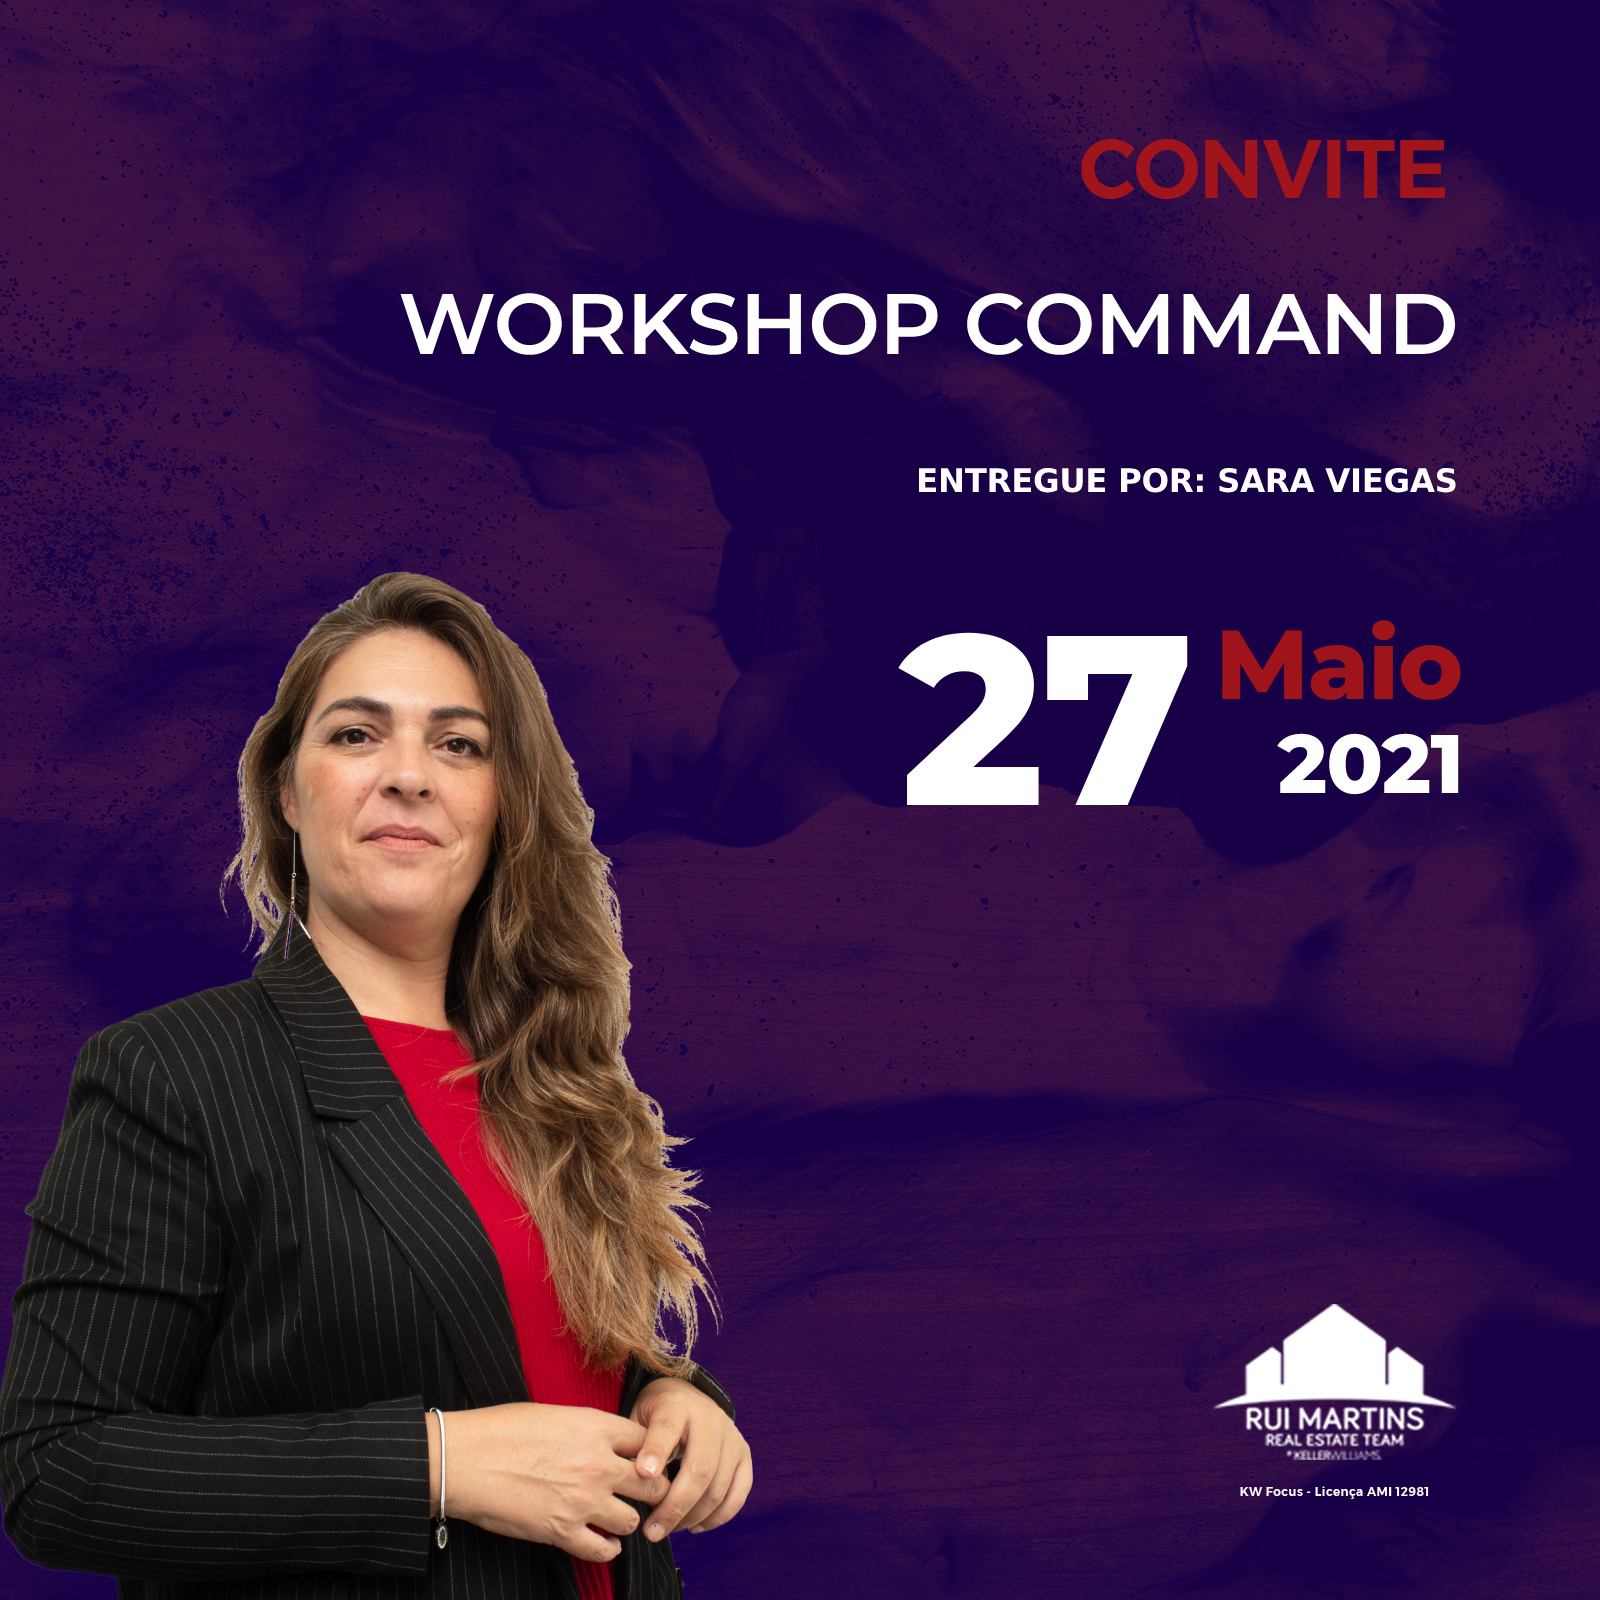 Workshop Command